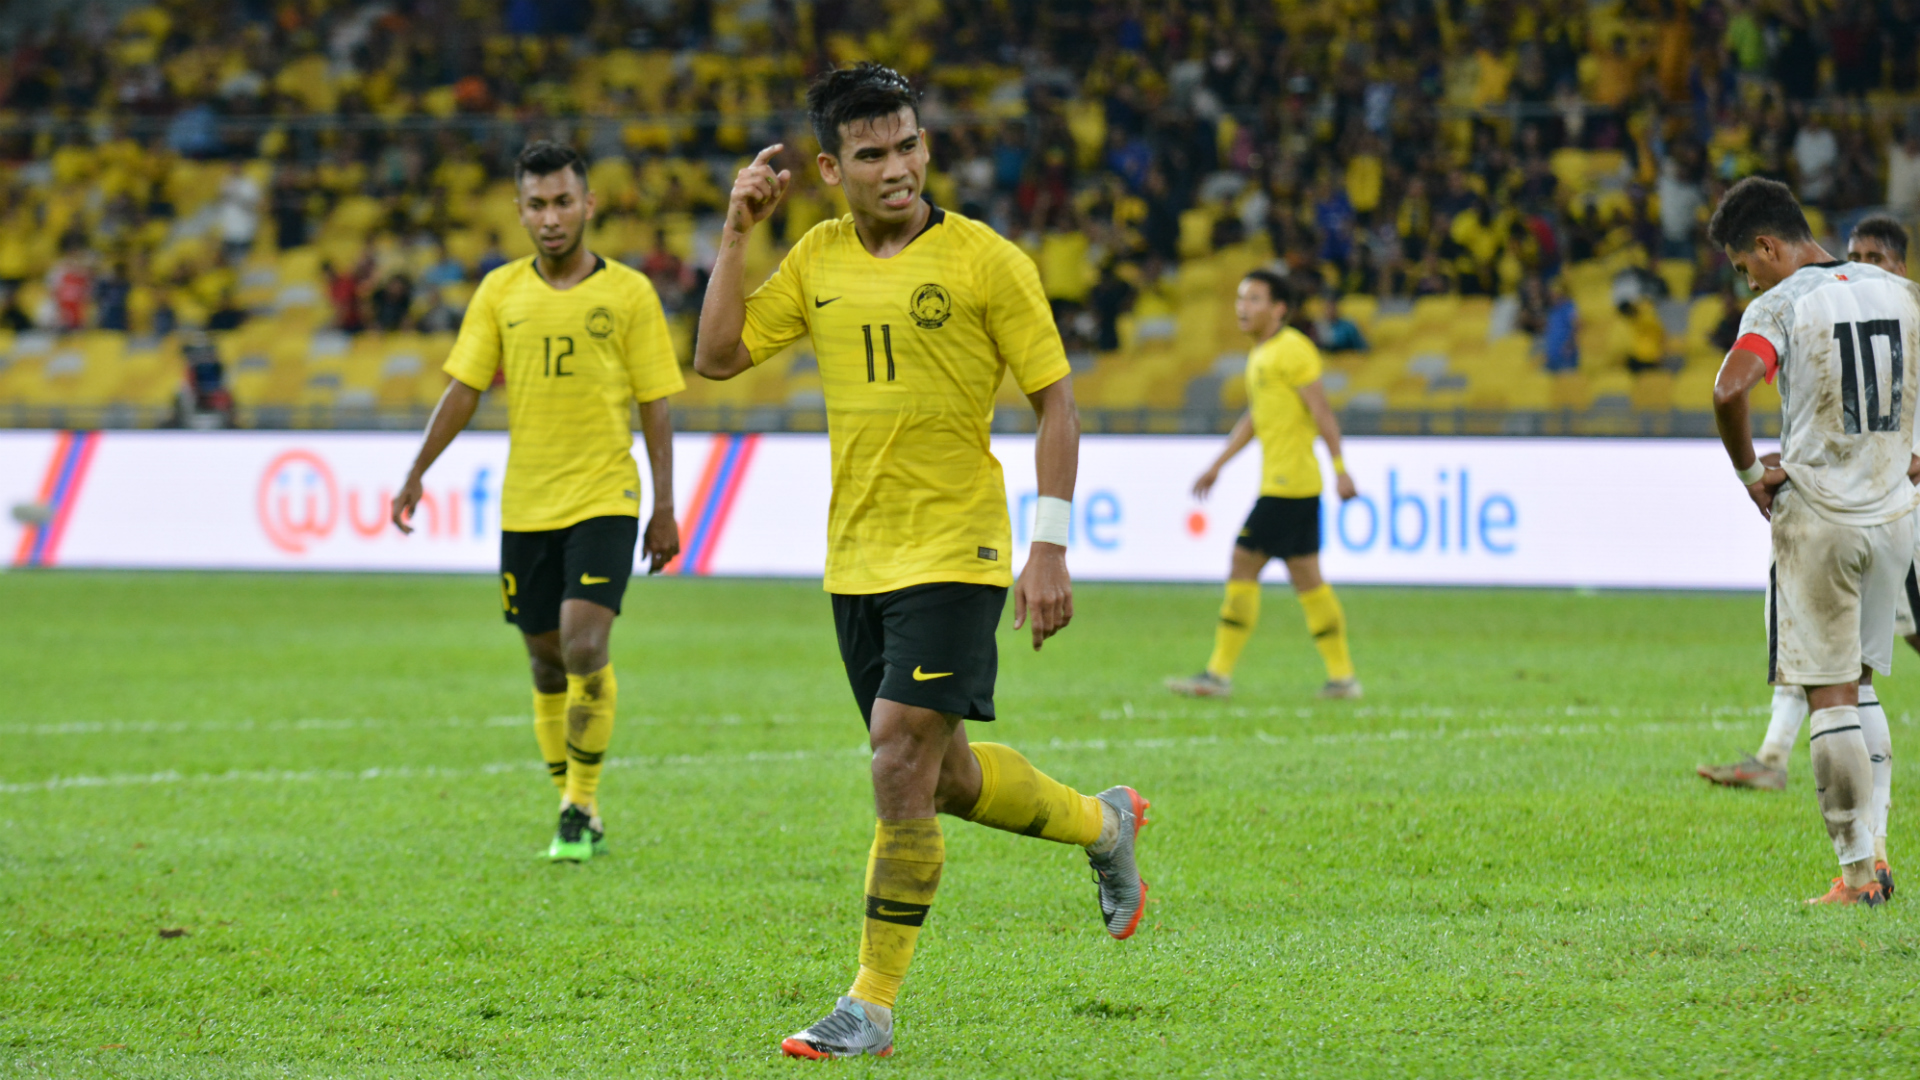 Safawi Rasid, Malaysia v Timor Leste, 2022 World Cup Qualification, 7 Jun 2019